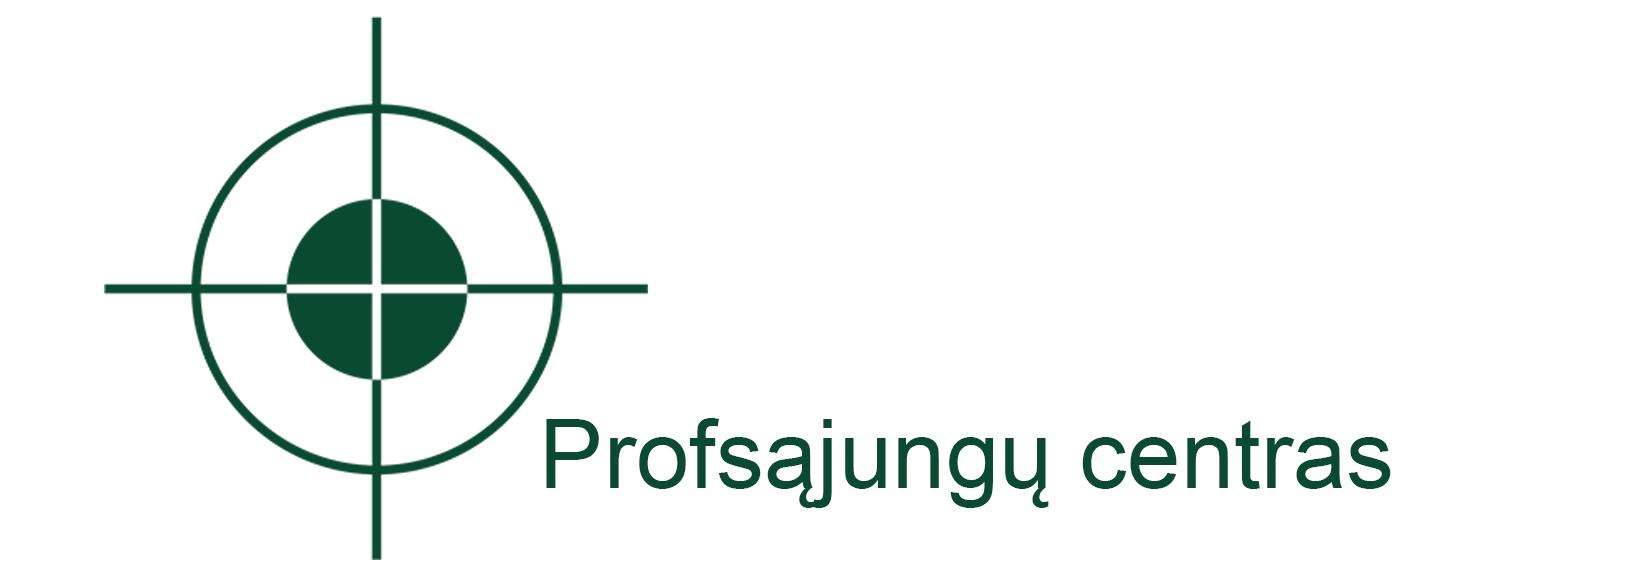 Profsąjungų centras